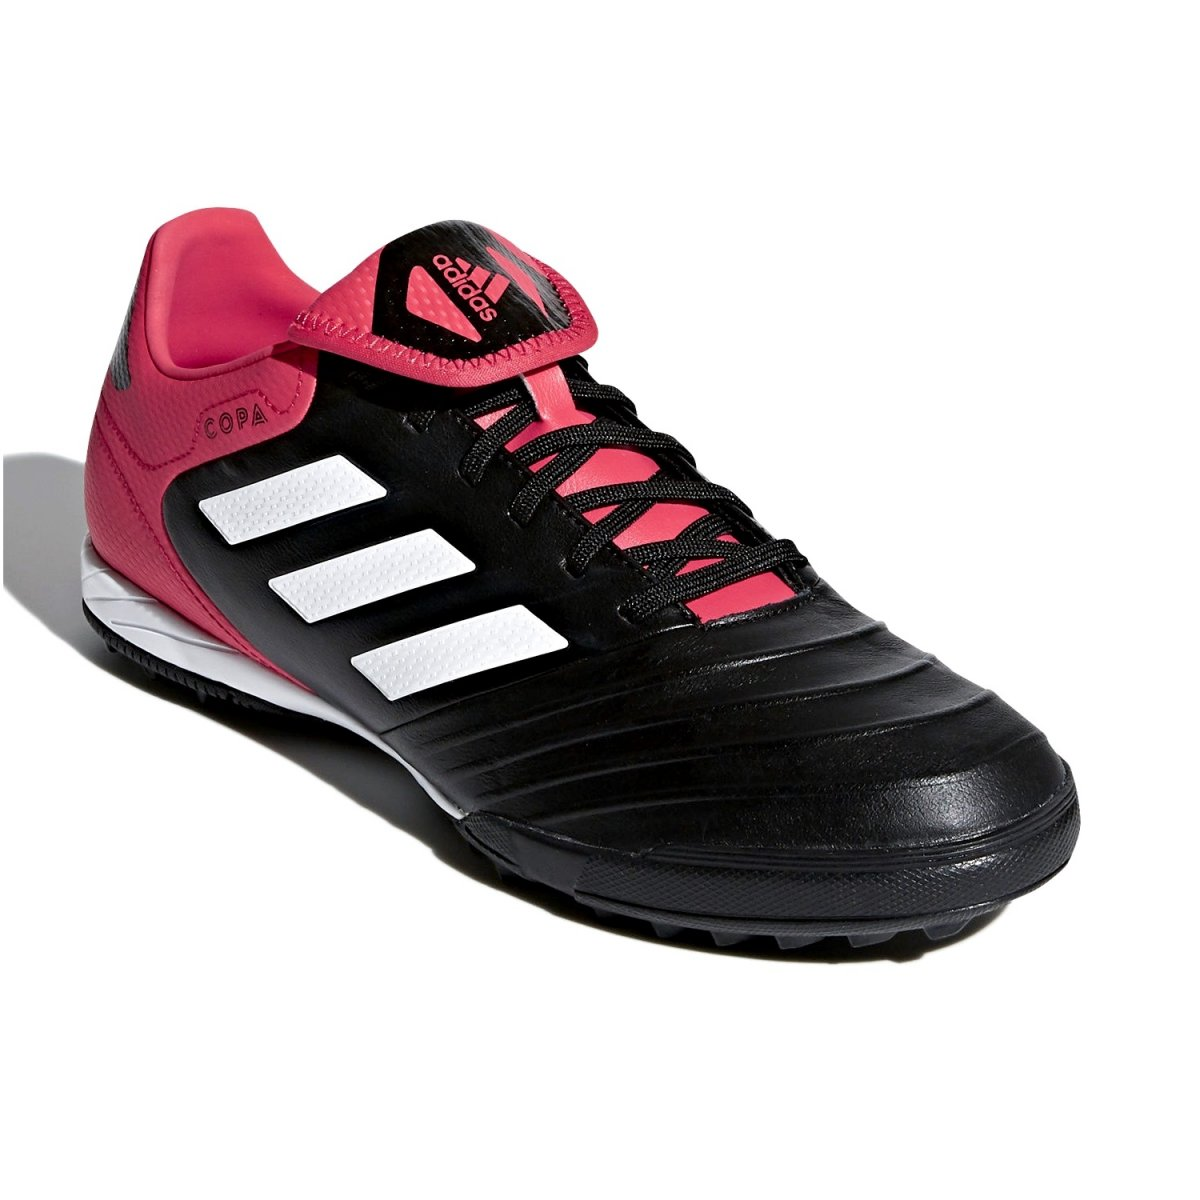 170a31ad2f Amplie a imagem. Chuteira Society Adidas Copa Tango 18.3 TF  Chuteira  Society Adidas Copa Tango 18.3 ...